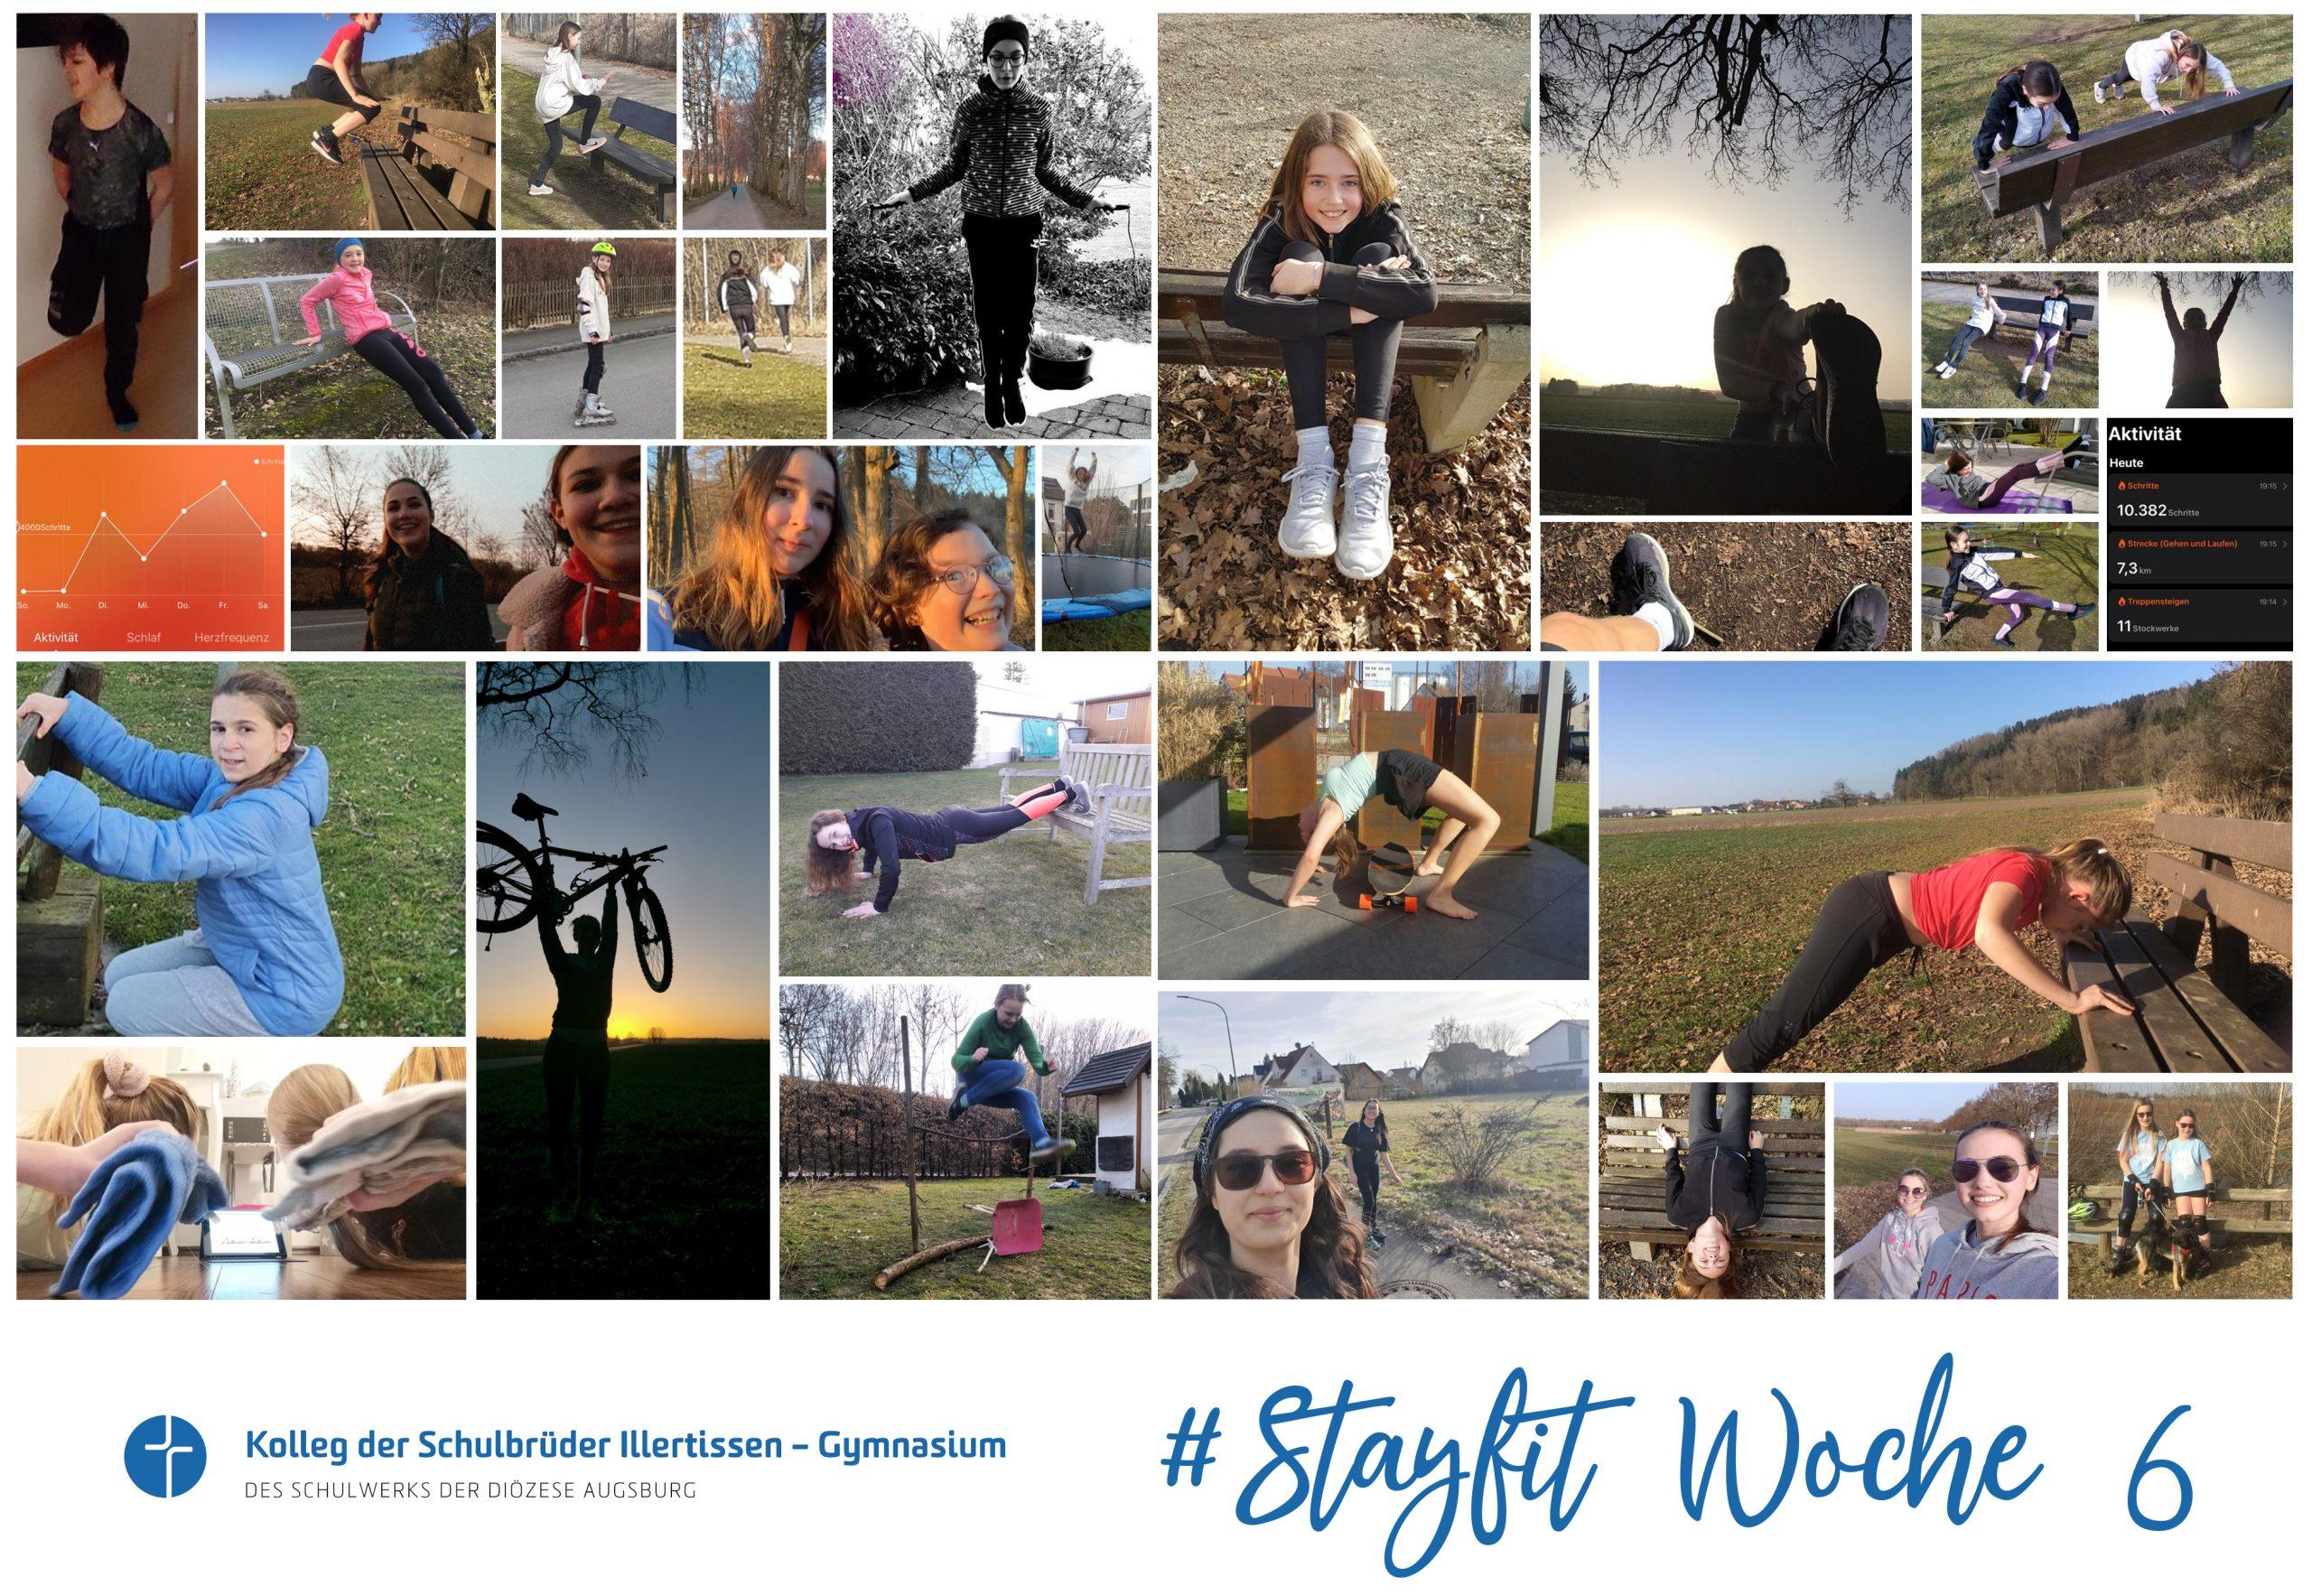 #stayfit Woche 6